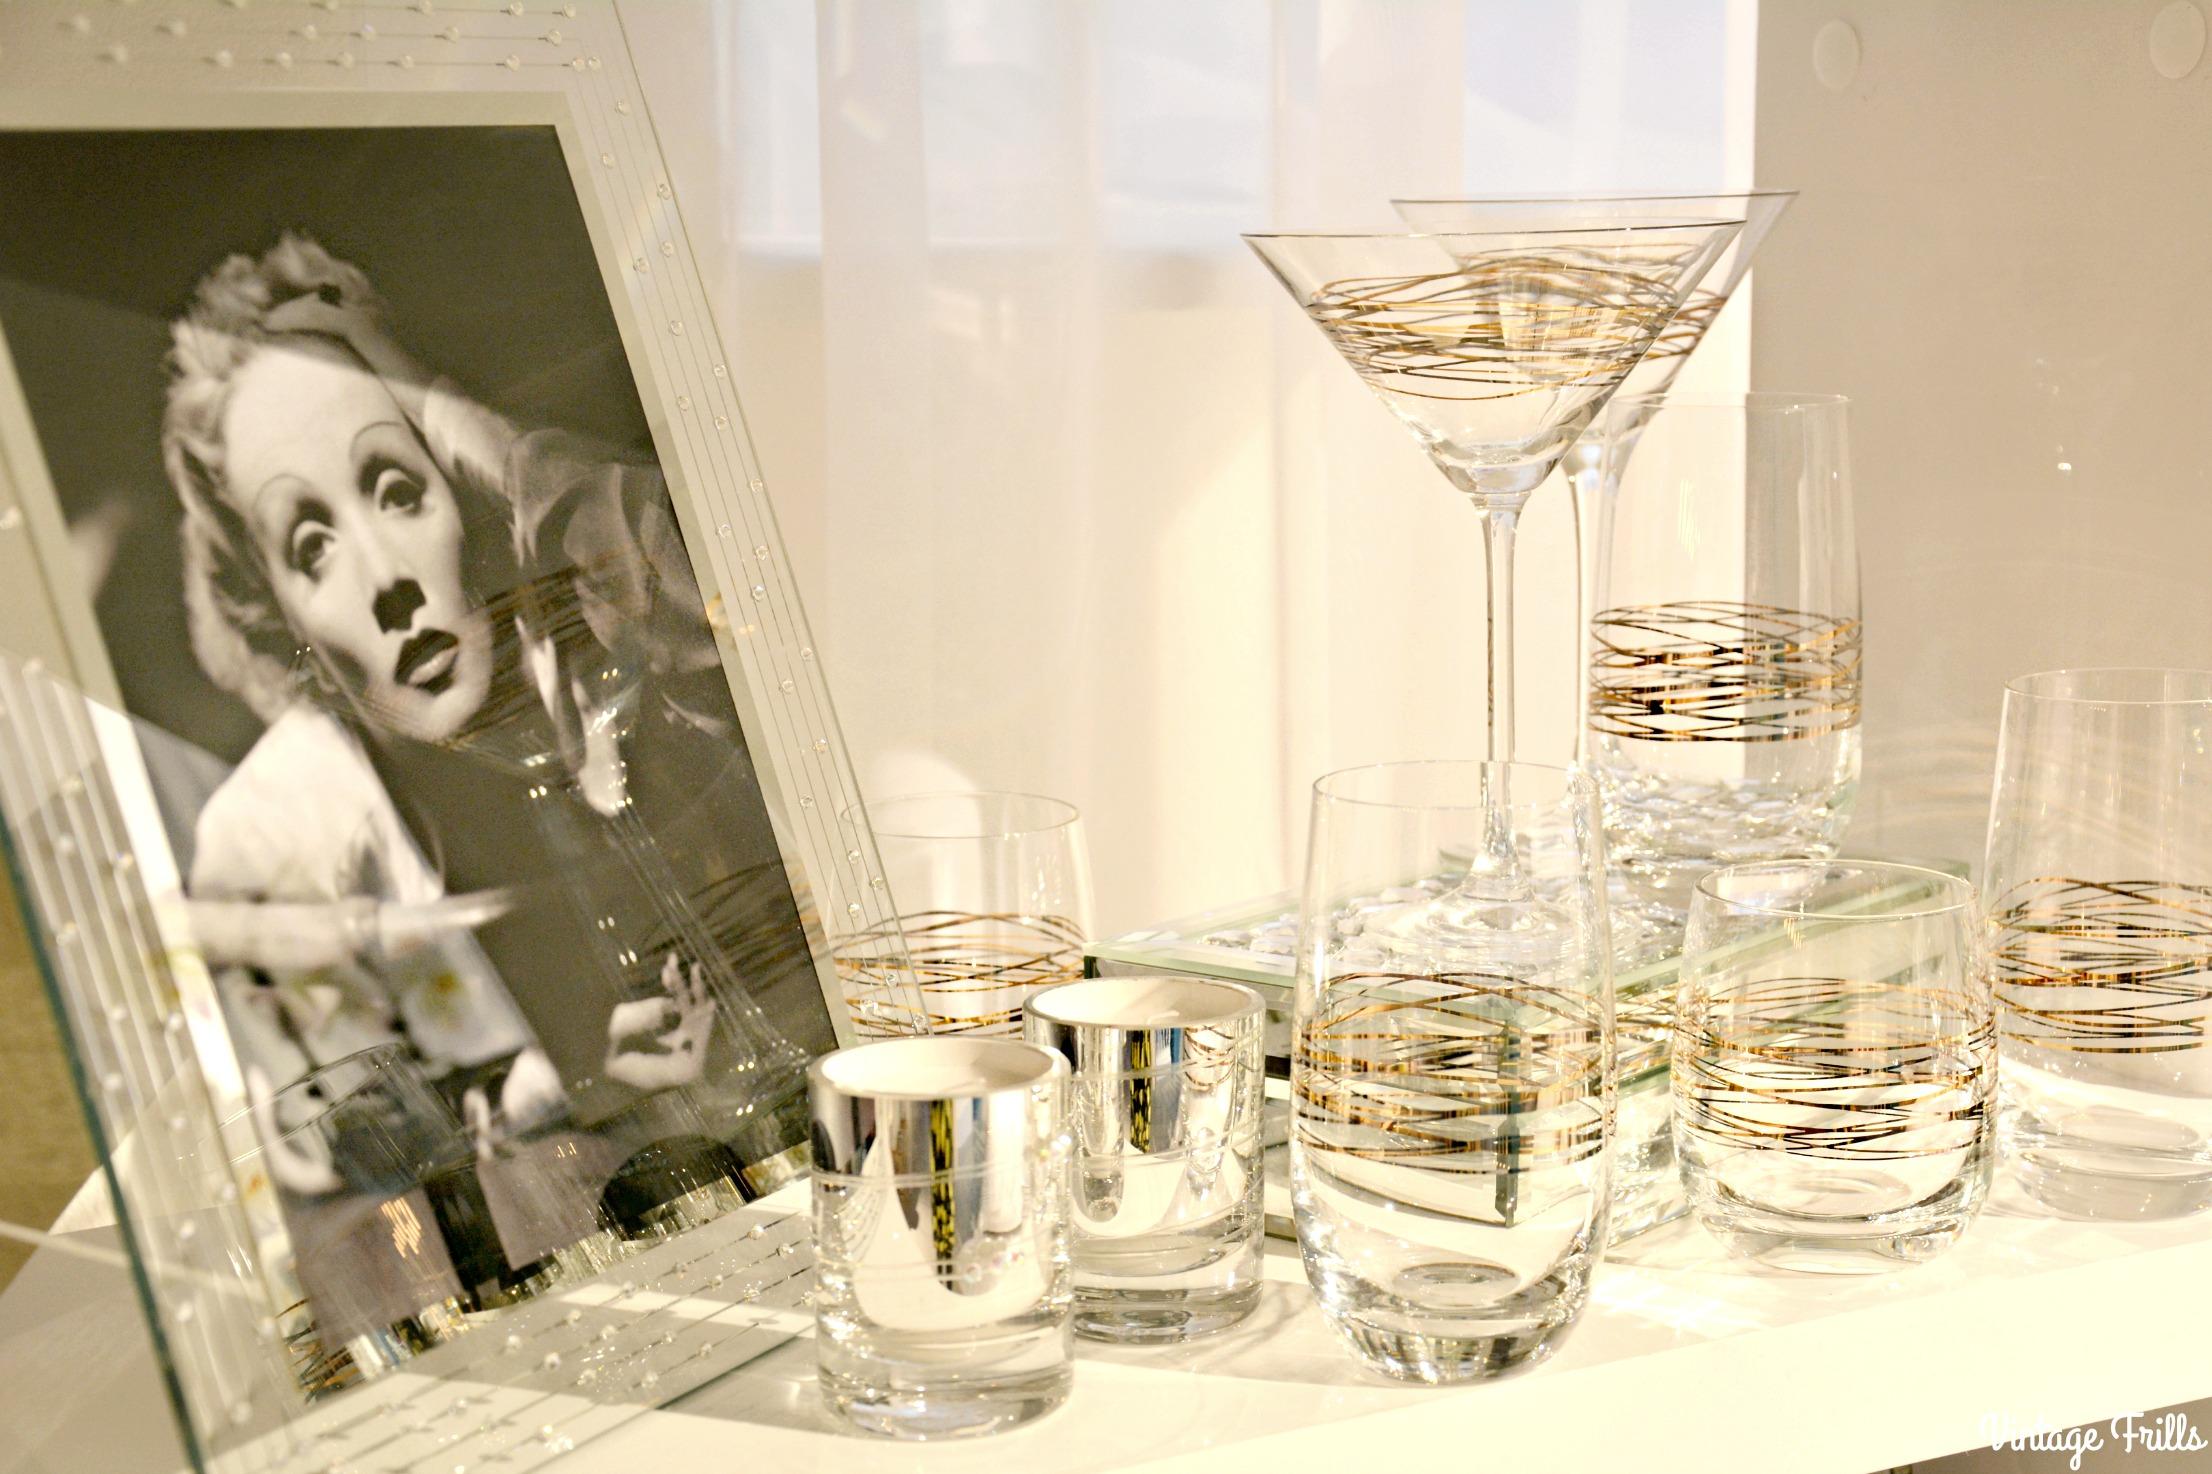 Home Inspiration - Old Hollywood Glamour • Vintage Frills